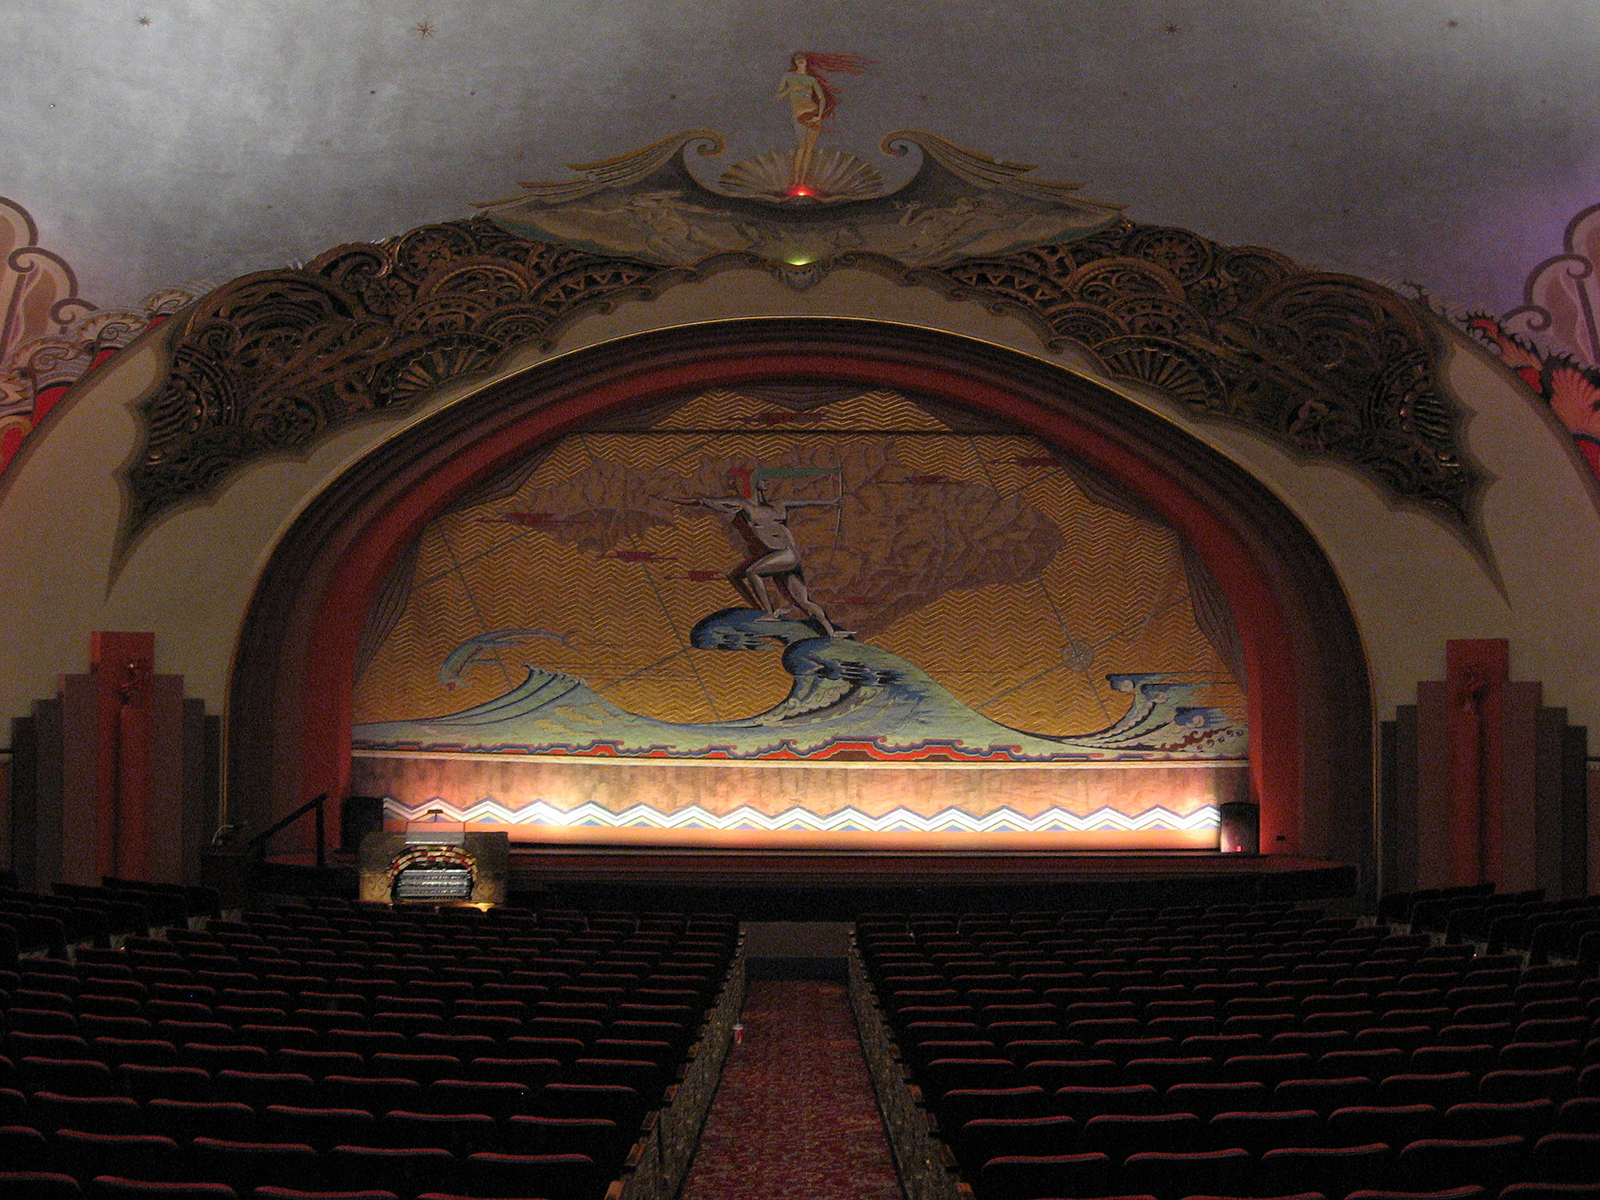 Avalon Theatre stage